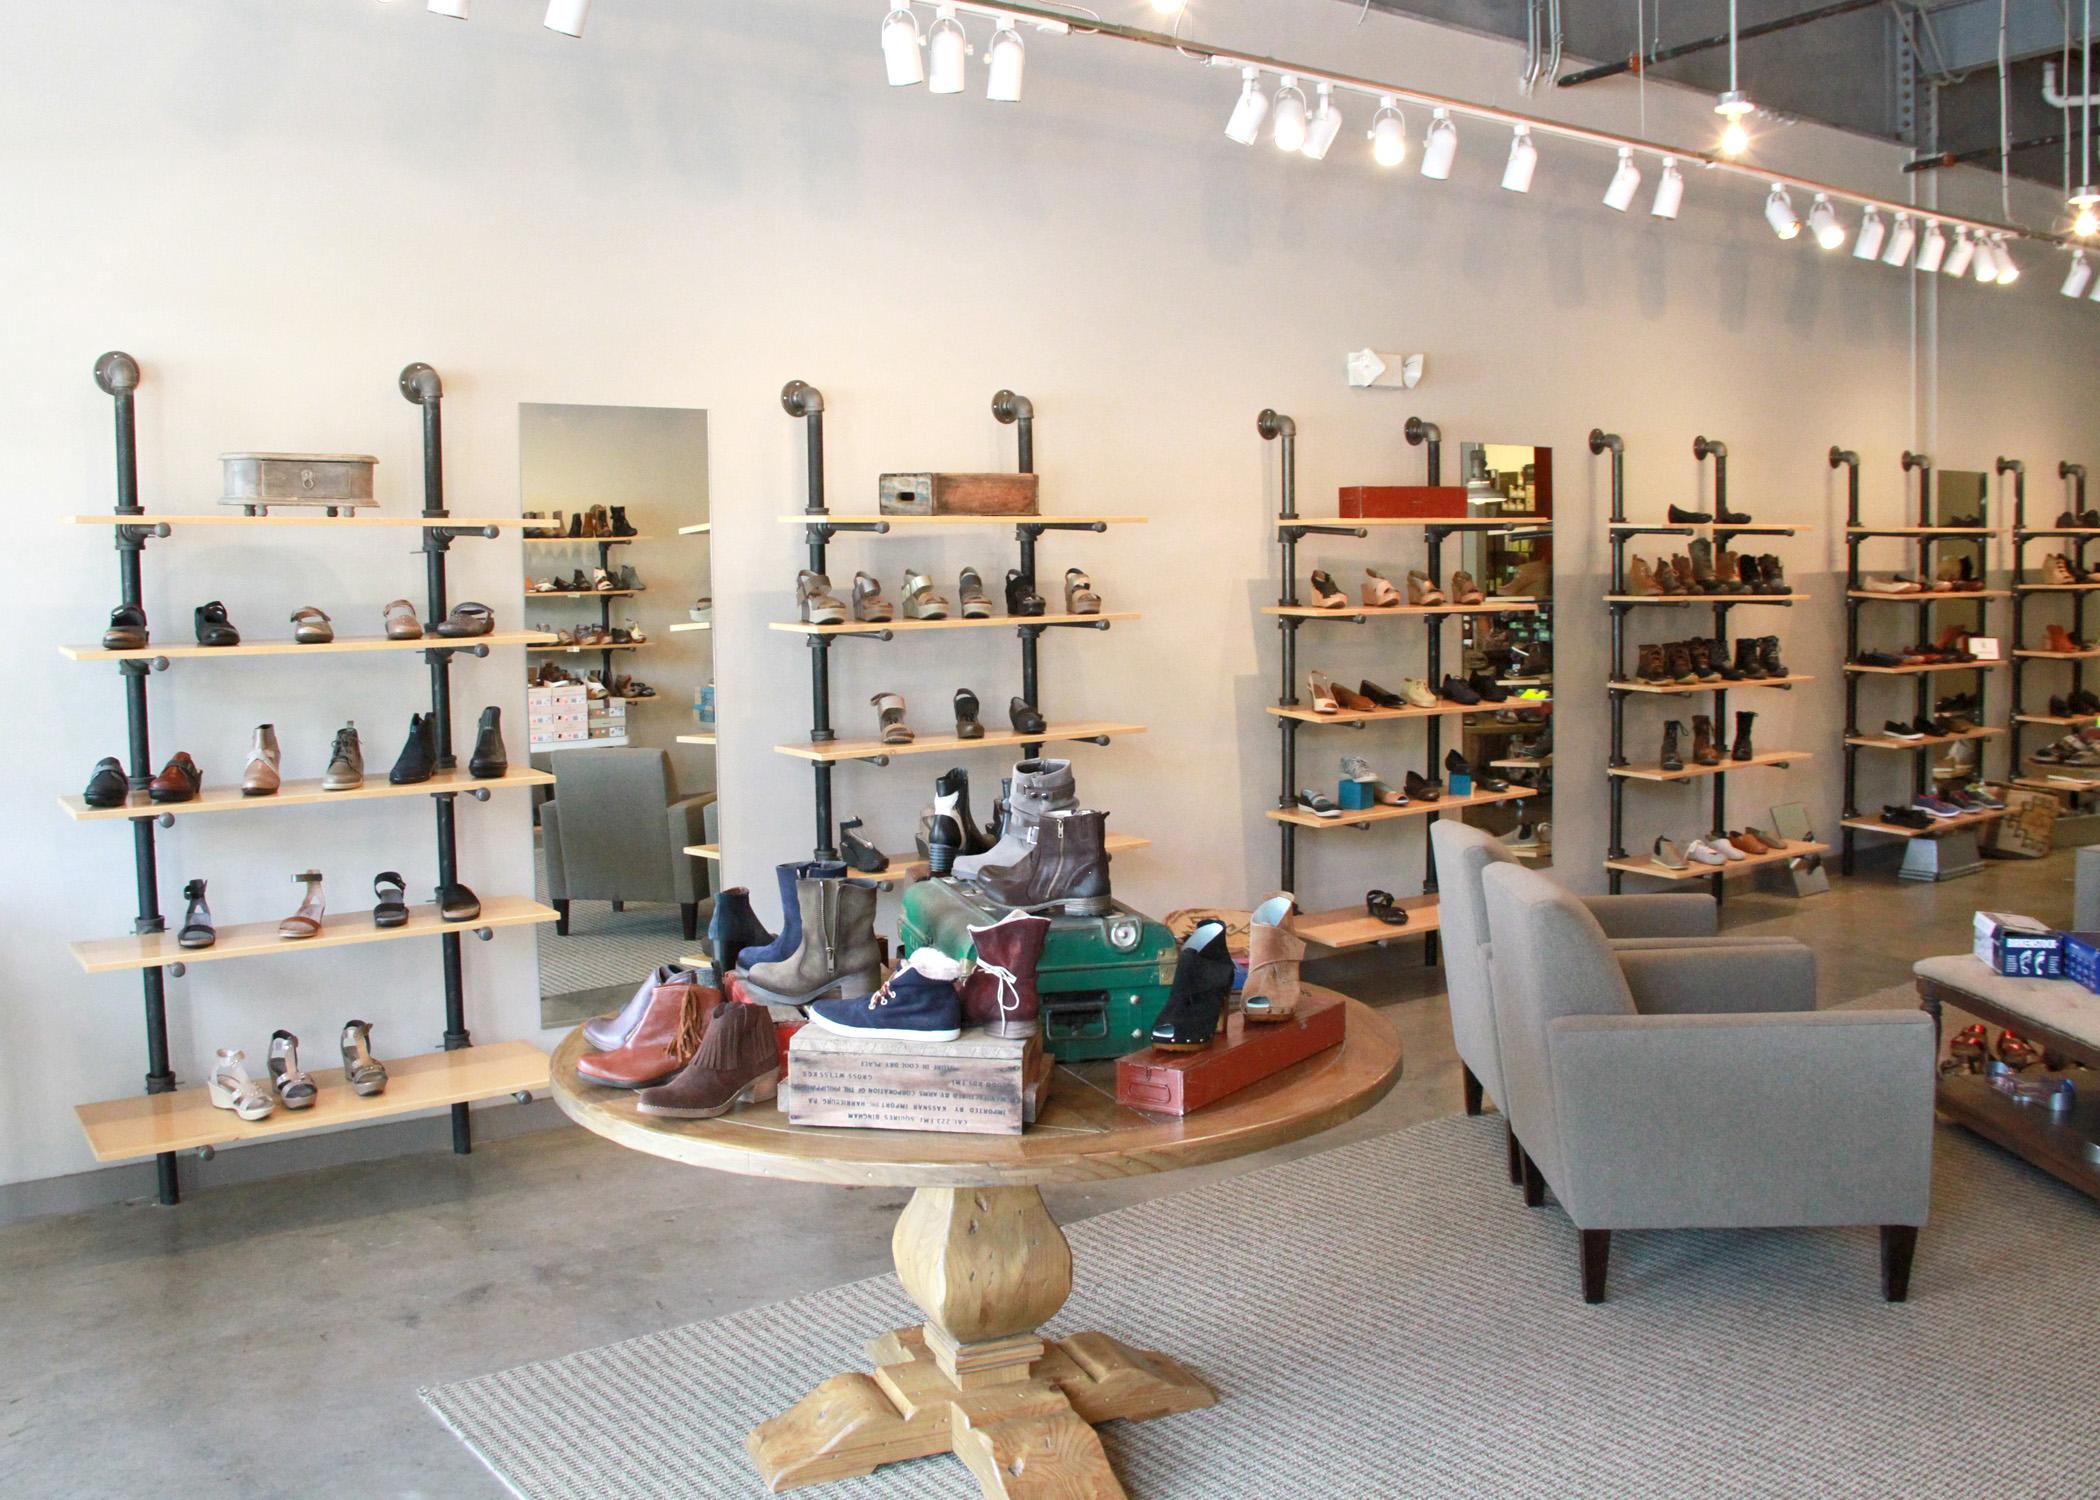 Chattanooga Shoe Company at 2 North Shore